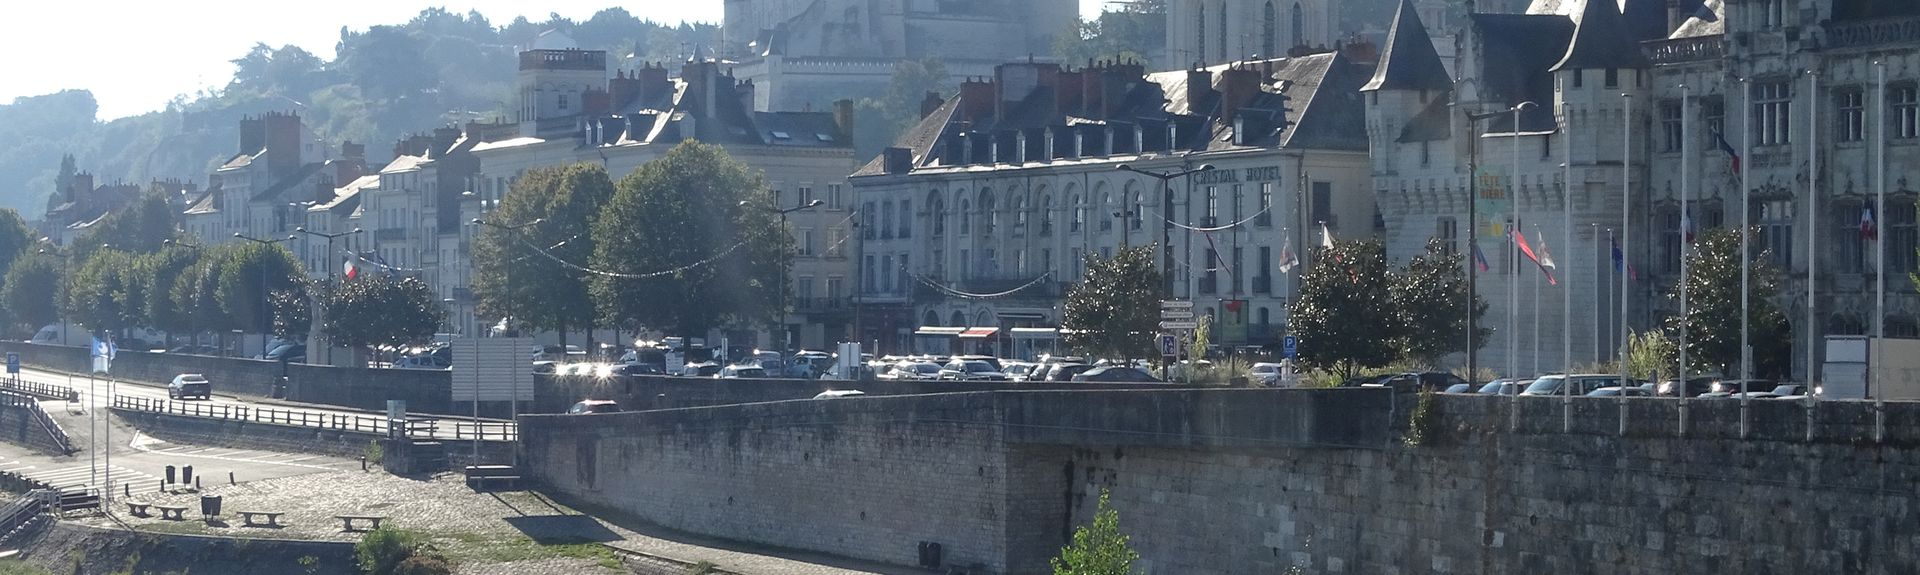 Argy, Indre (distrikt), Frankrike